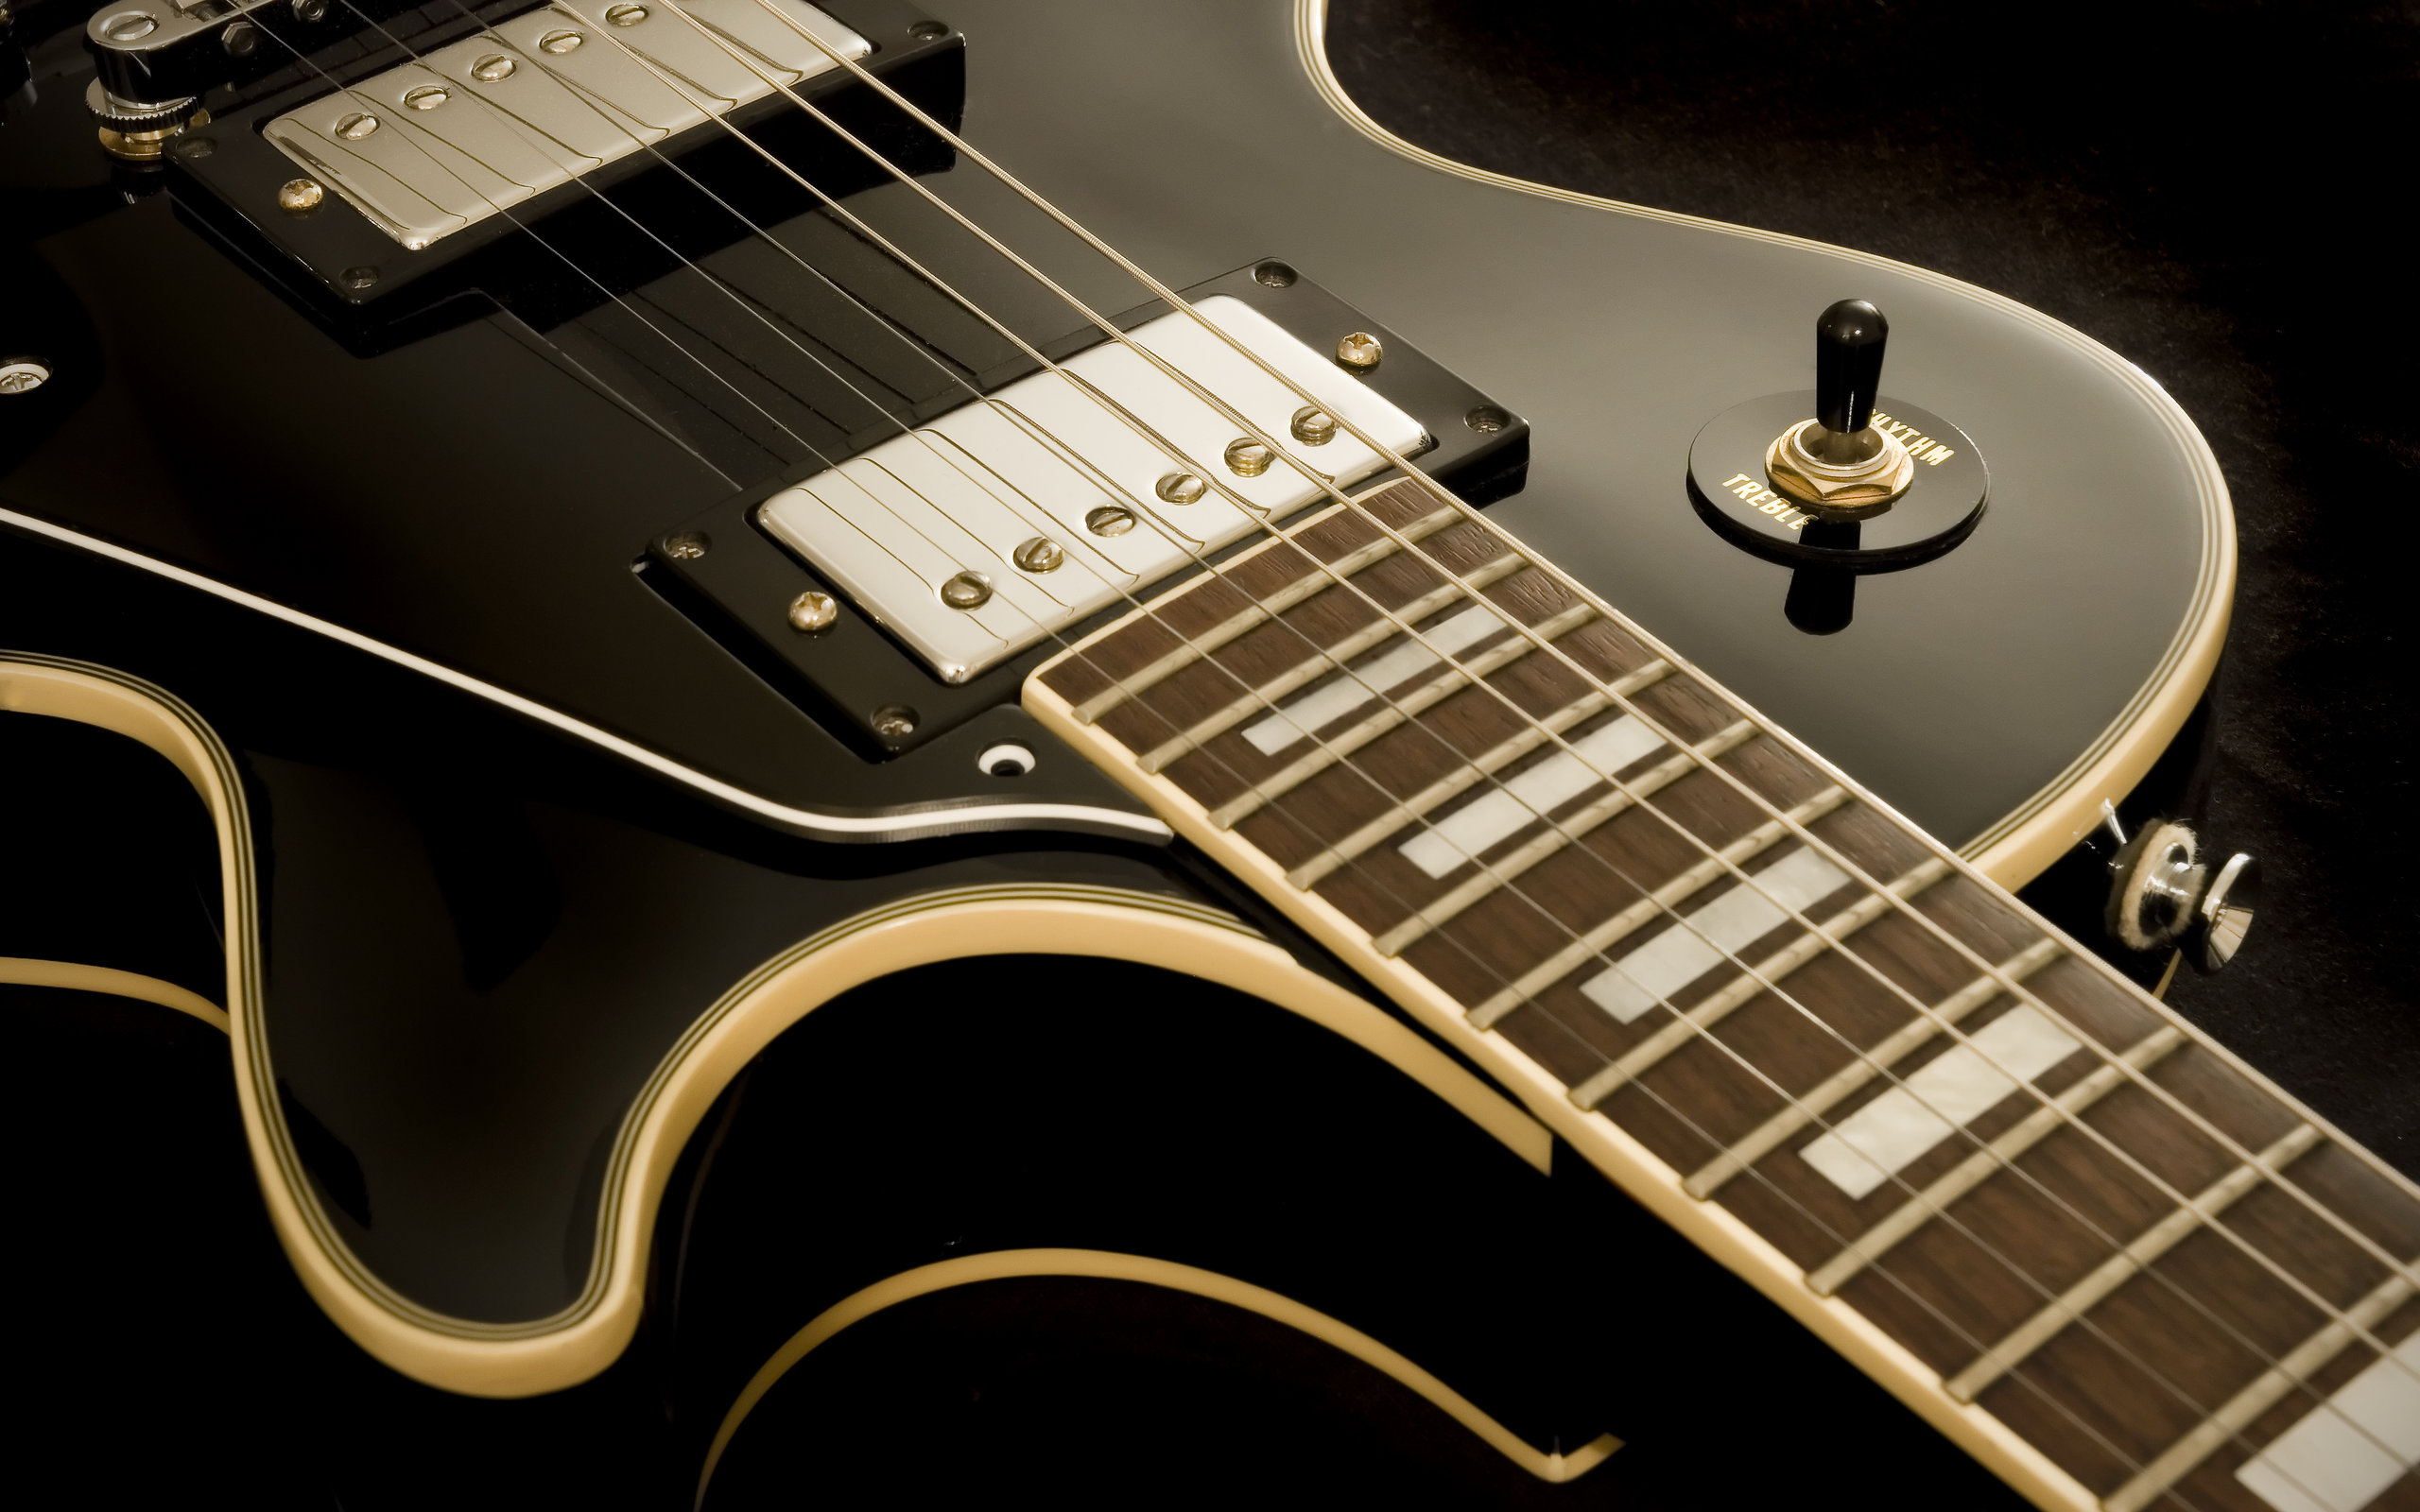 Modern Metal Rhythm Guitar, Lesson 1 - Octave Displacement